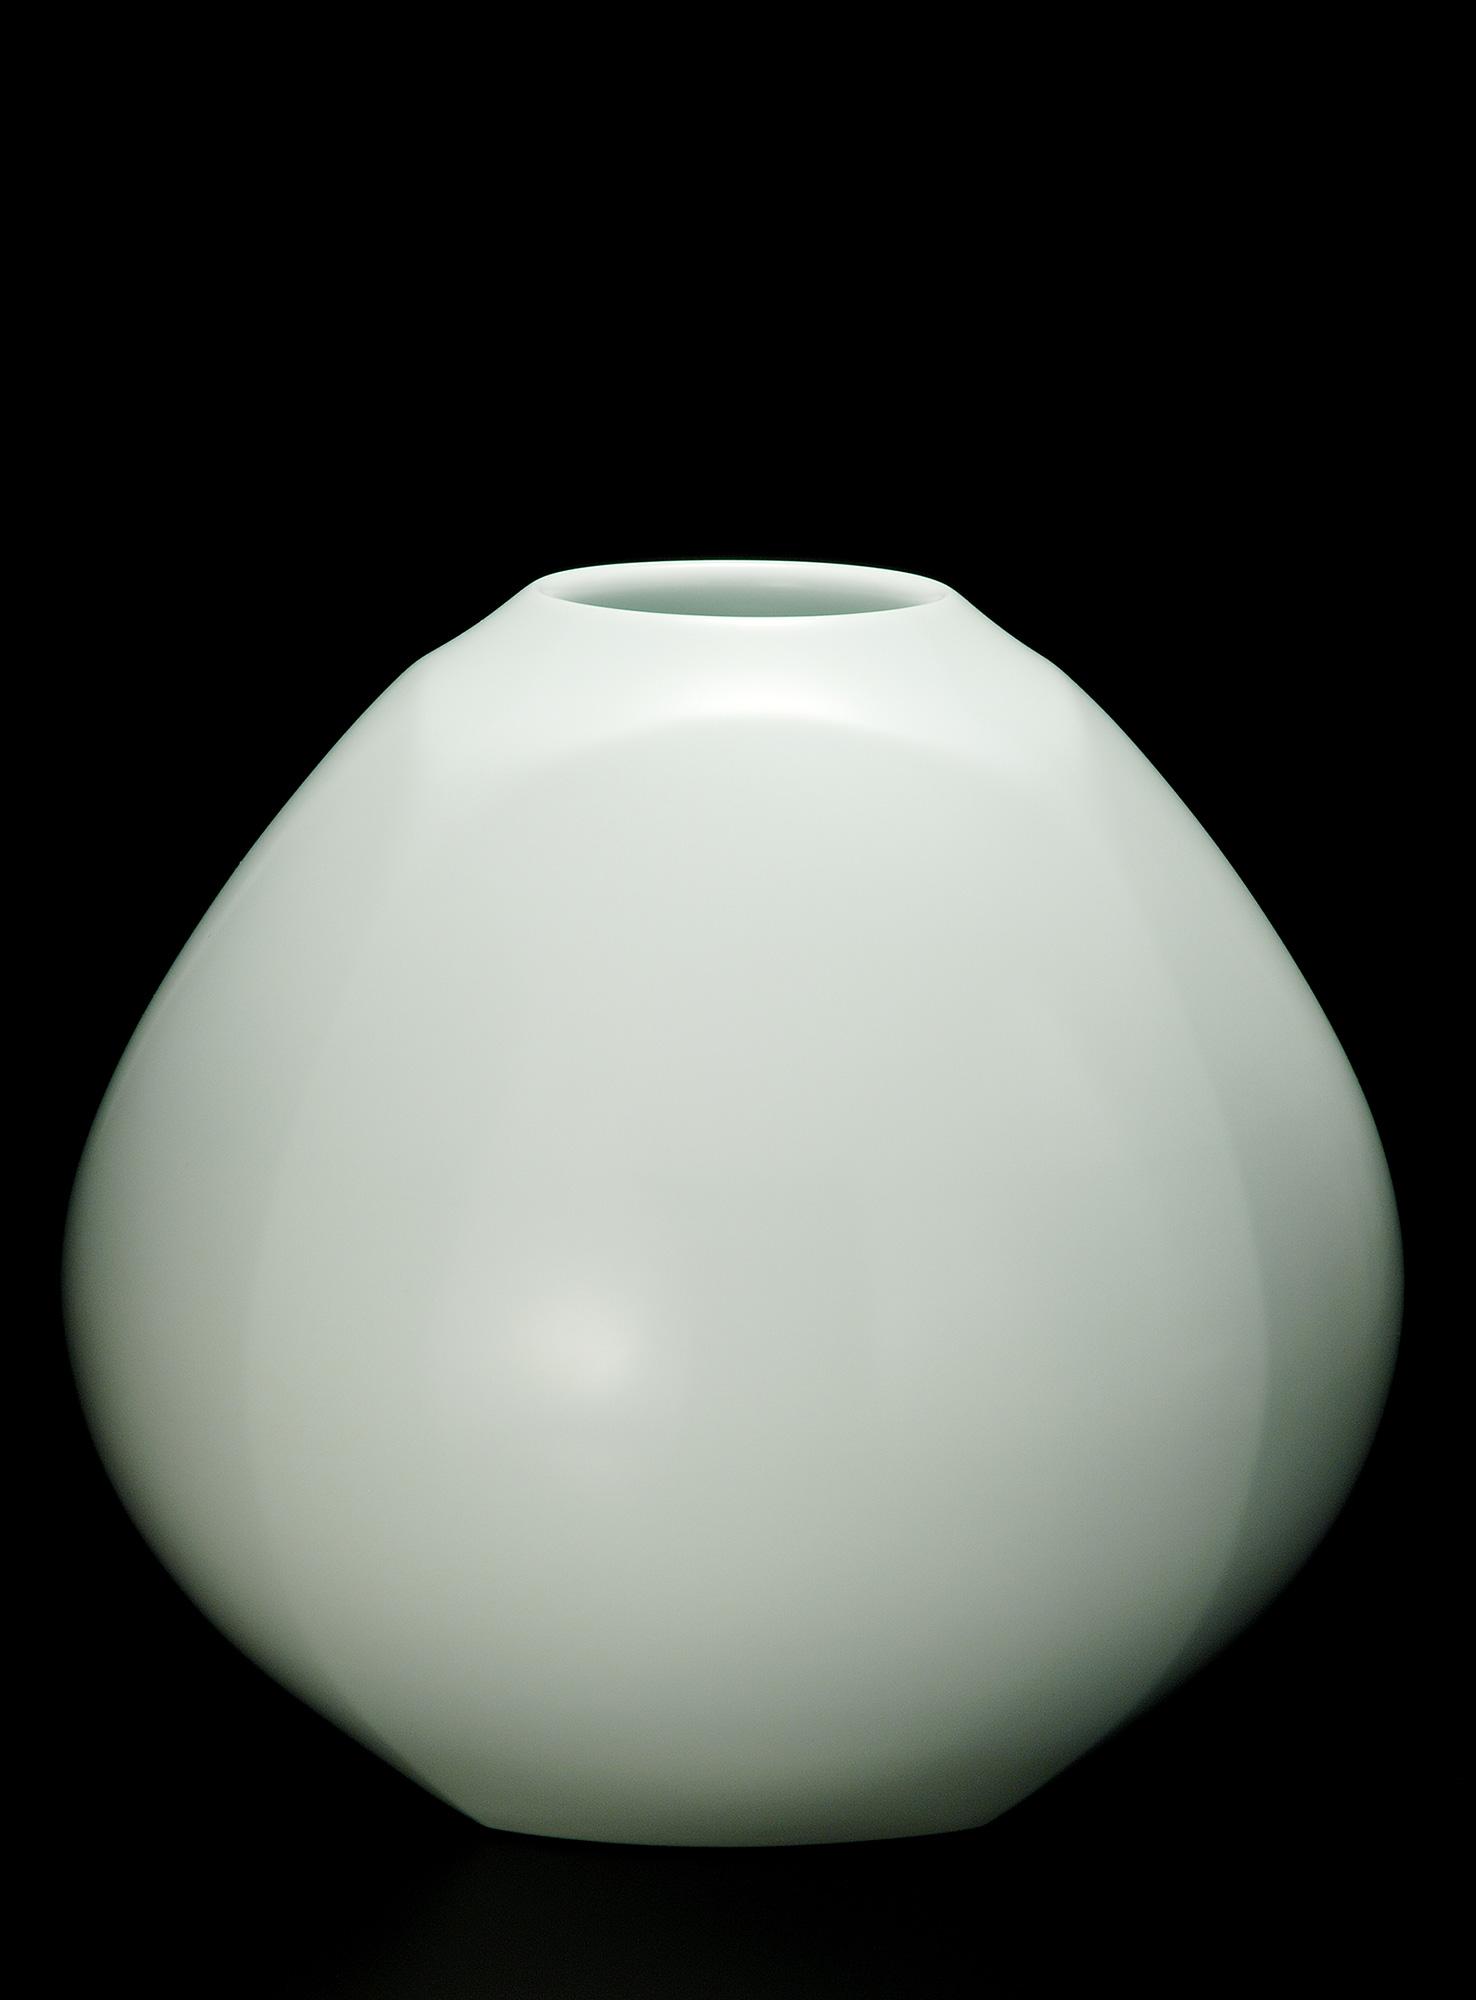 White Porcelain Faceted Vase(2010)